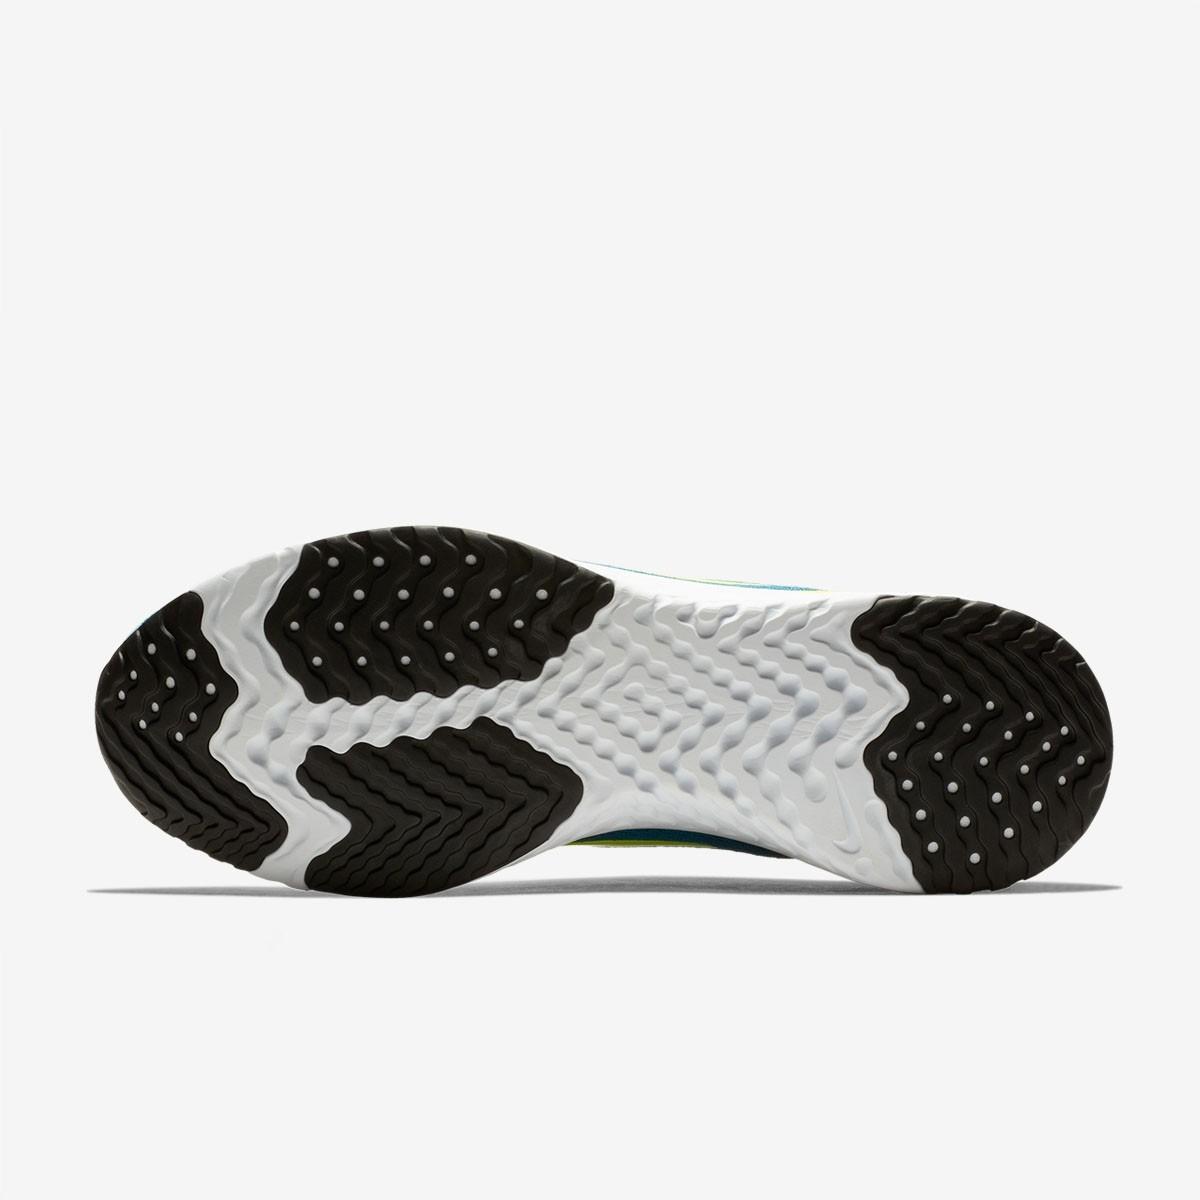 Nike Odyssey React 'Blue Neon' AO9819-302